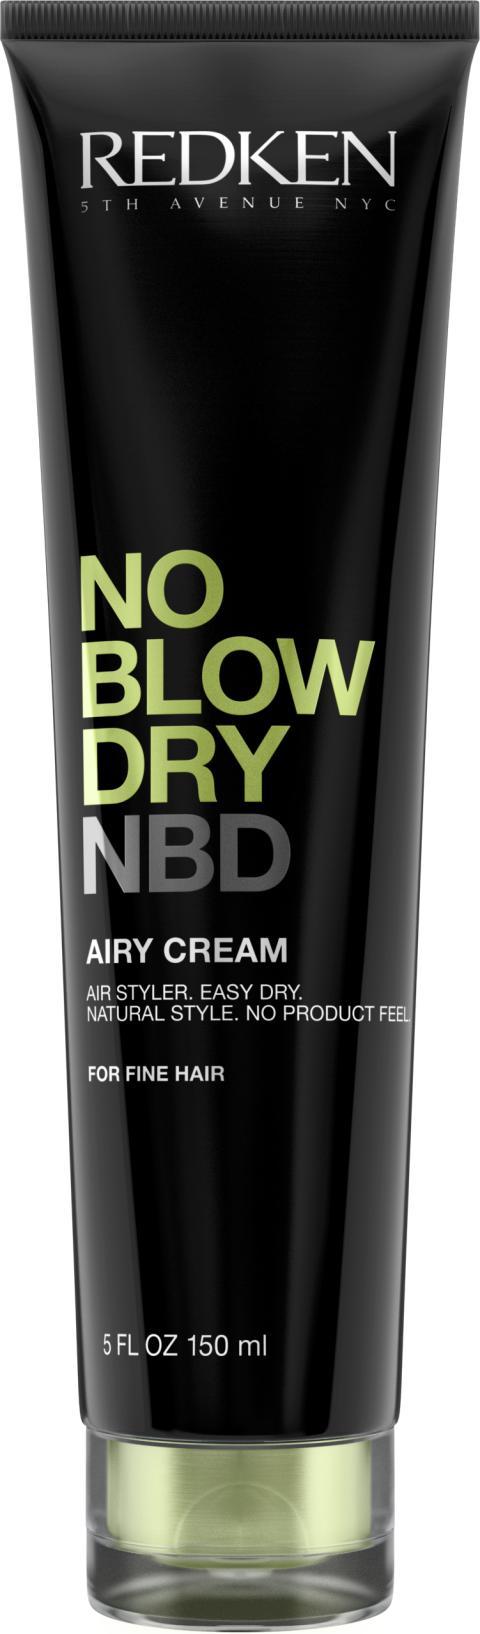 REDKEN- NO BLOW DRY- FINE HAIR, 250 kr